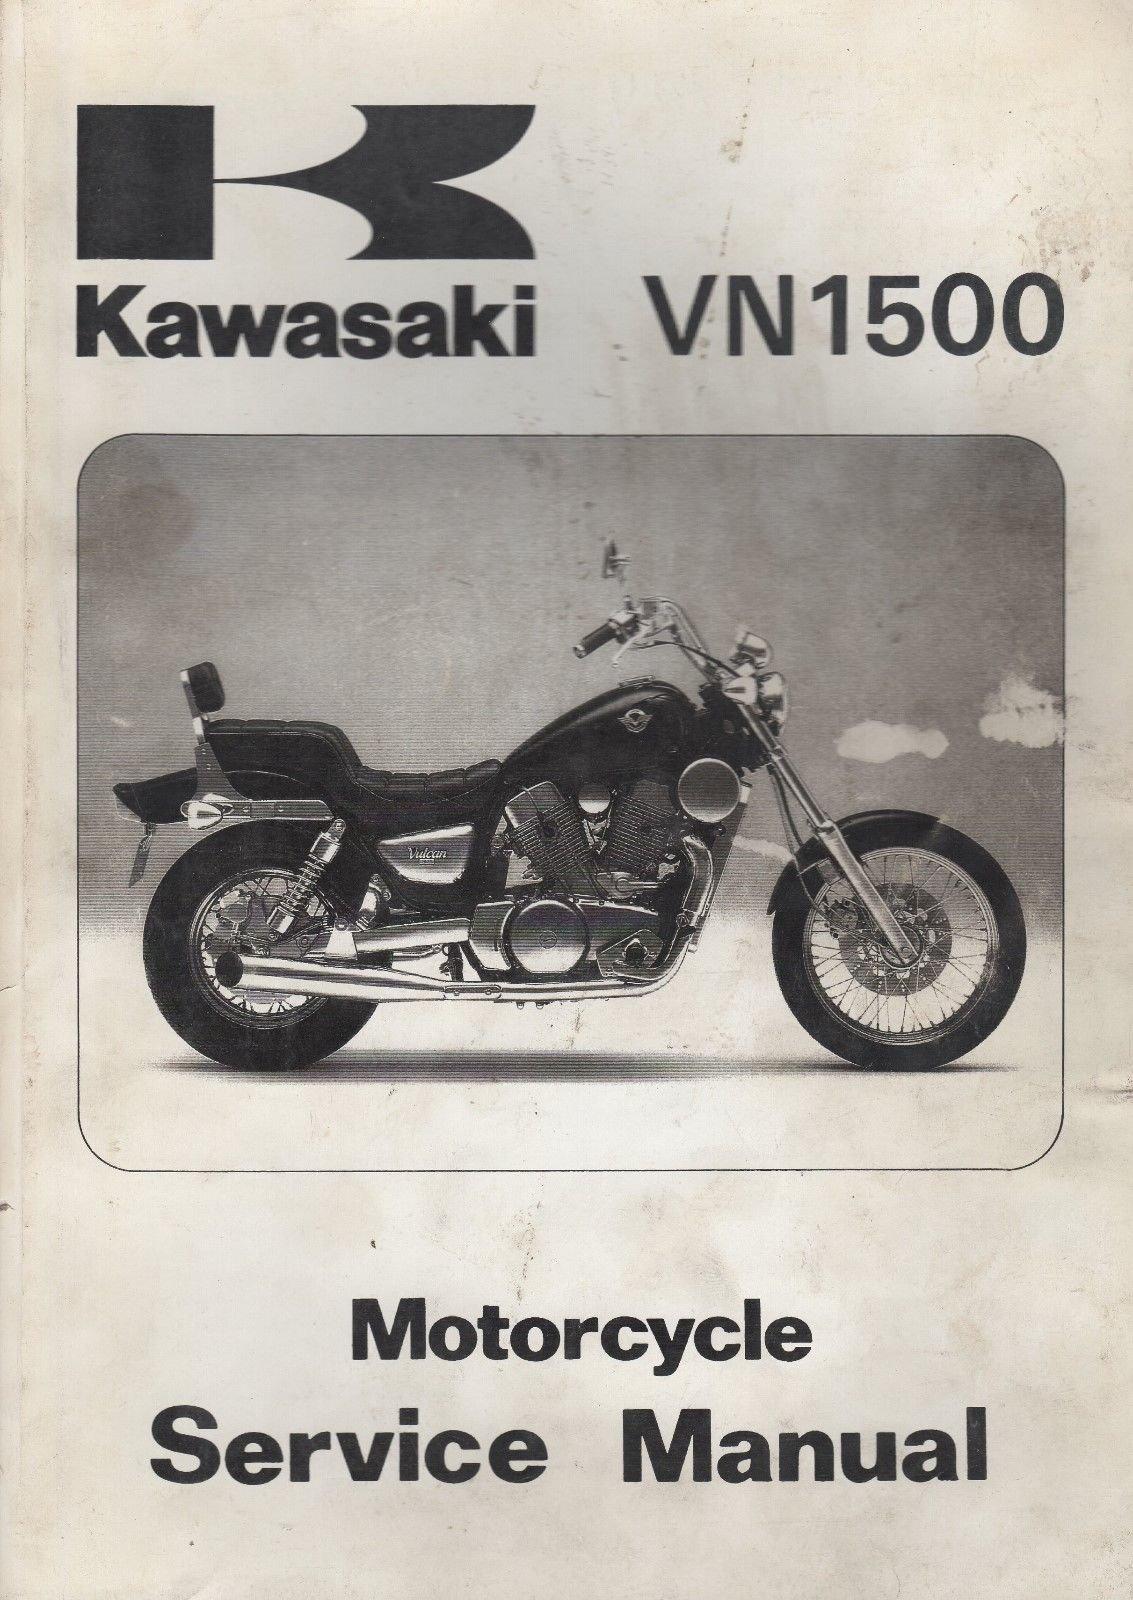 1987-1999 KAWASAKI MOTORCYCLE VN1500 SERVICE MANUAL 99924-1079-08 (912):  KAWASAKI: Amazon.com: Books